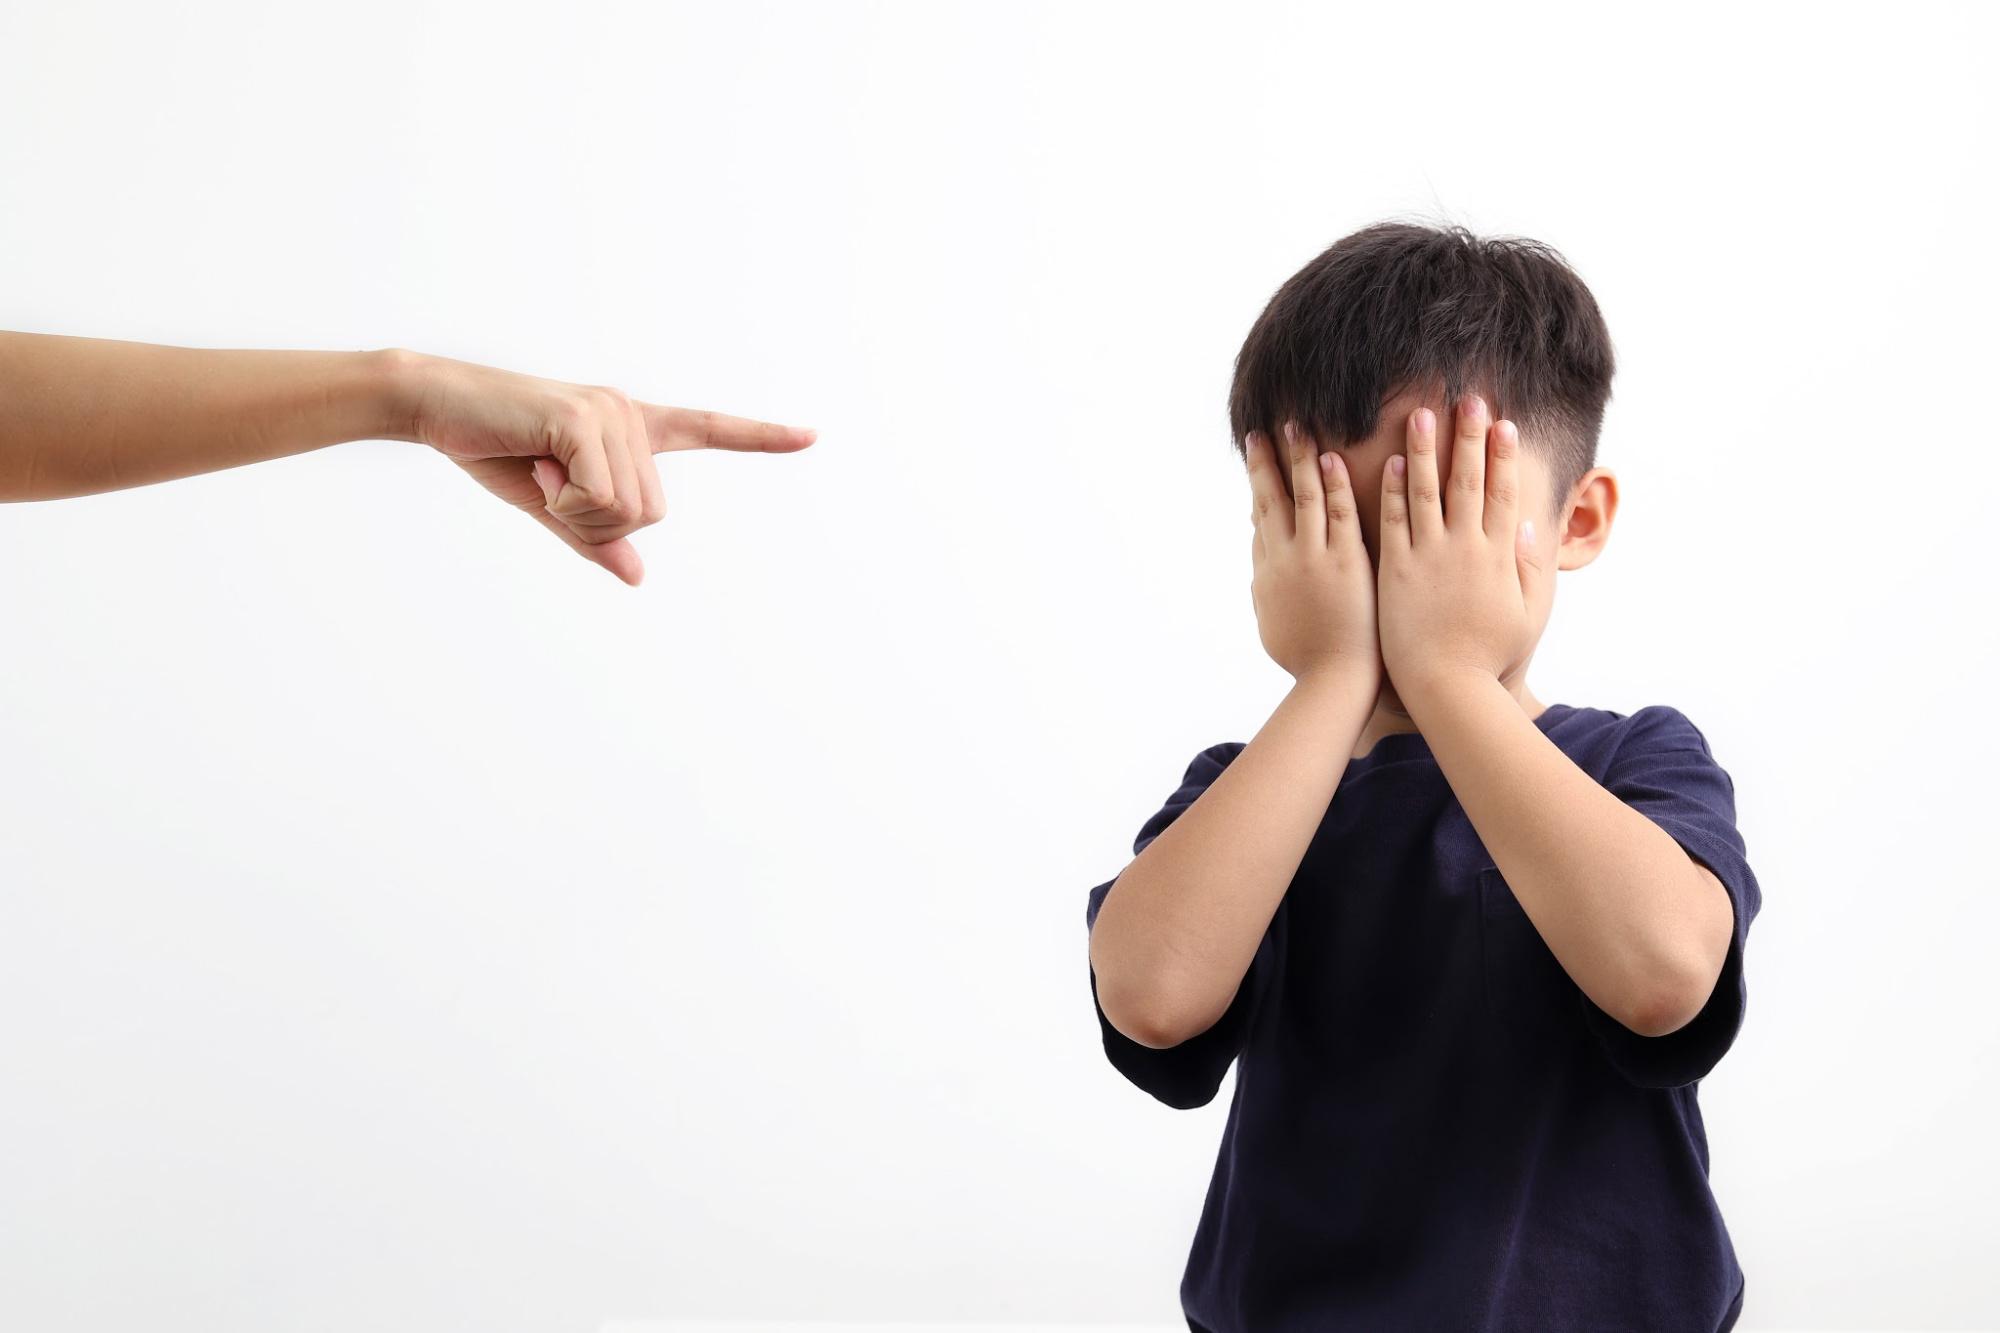 Arm of parent scolding scared little boy.